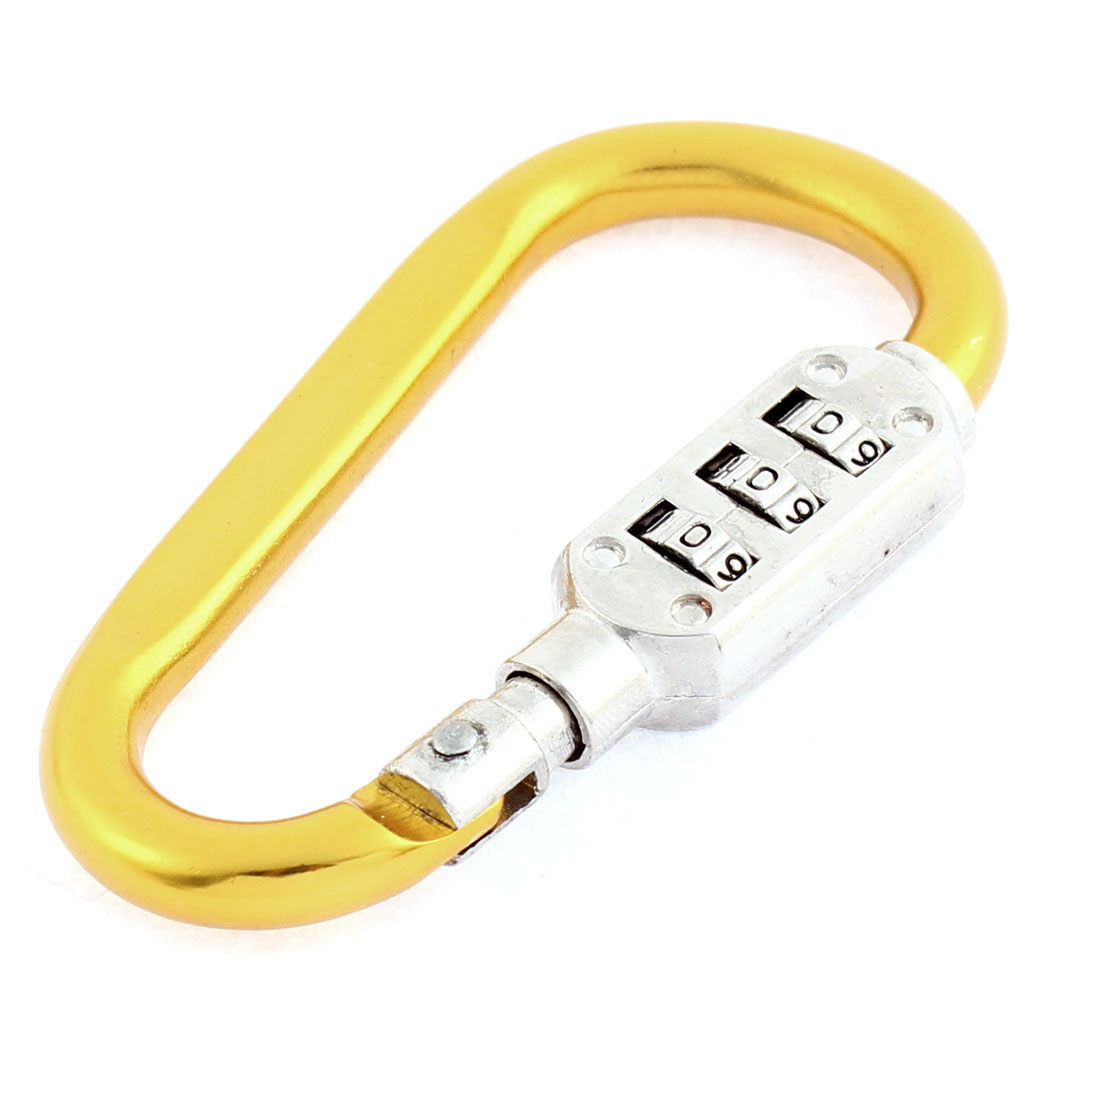 Aluminum Locking Carabiners 3 Digits Combination Lock Carabiner Hook,Random Color Pack of 6